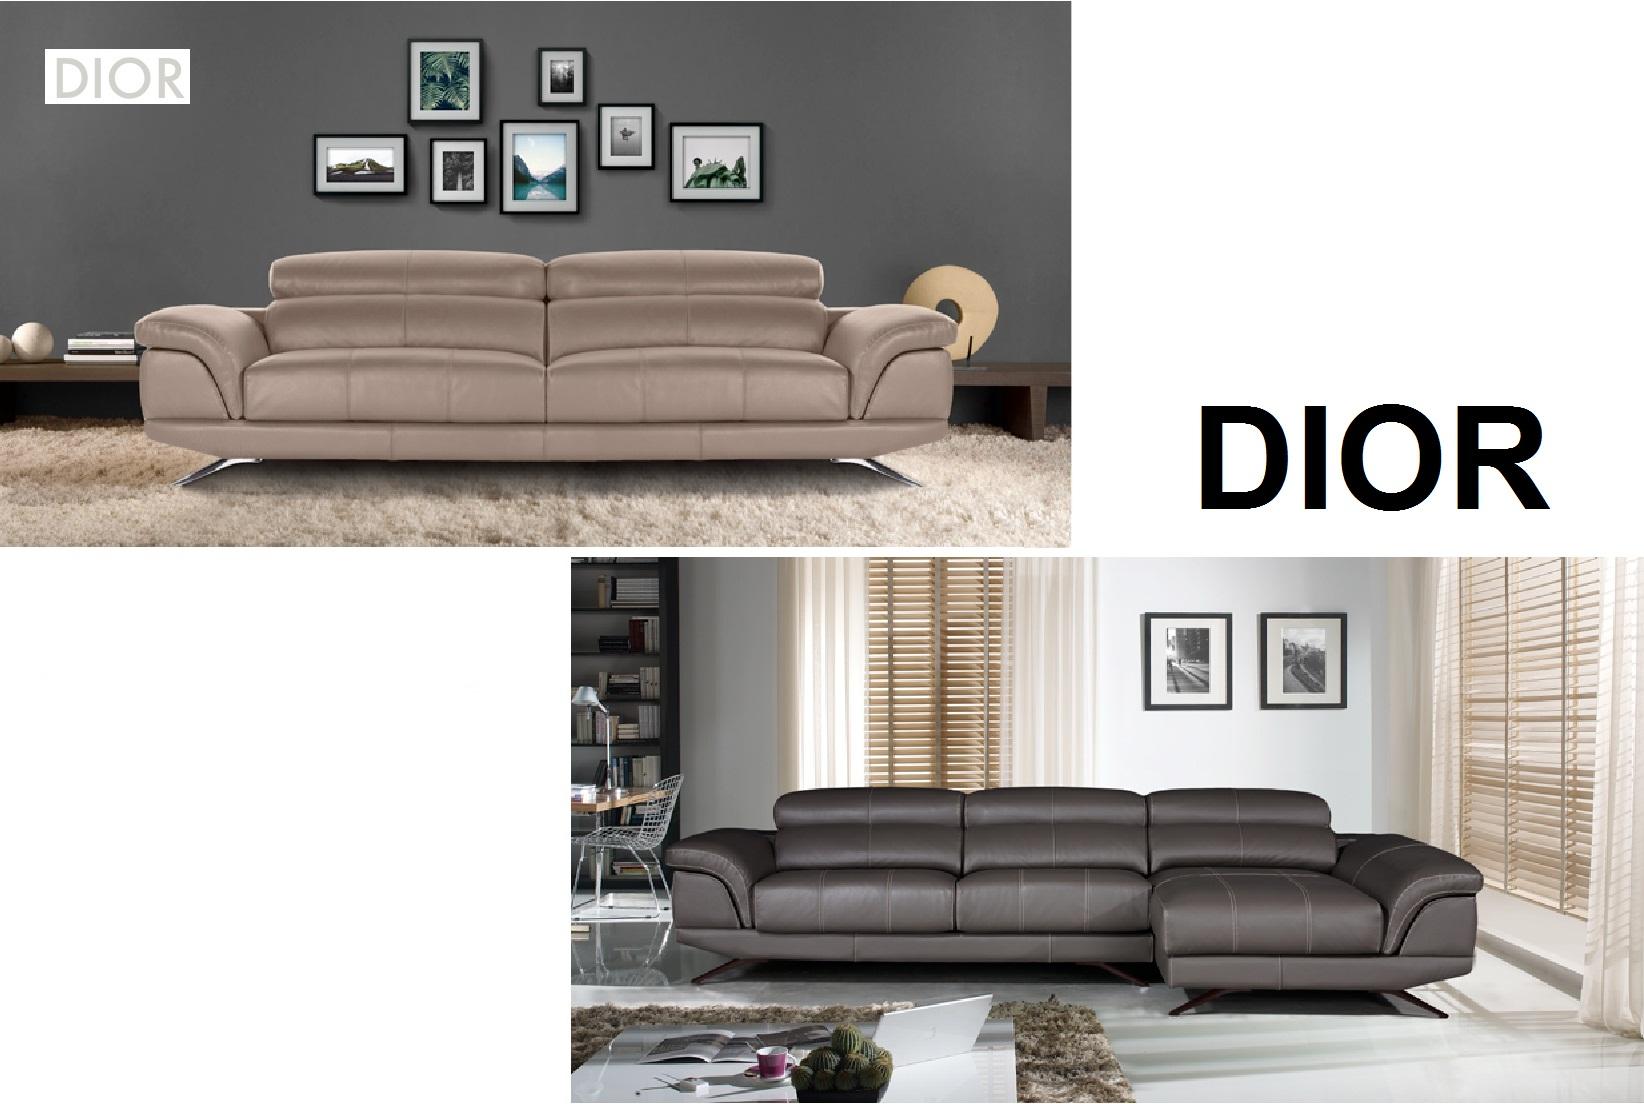 assise fixe relax interieur chezsoidesign st cyr sur mer. Black Bedroom Furniture Sets. Home Design Ideas